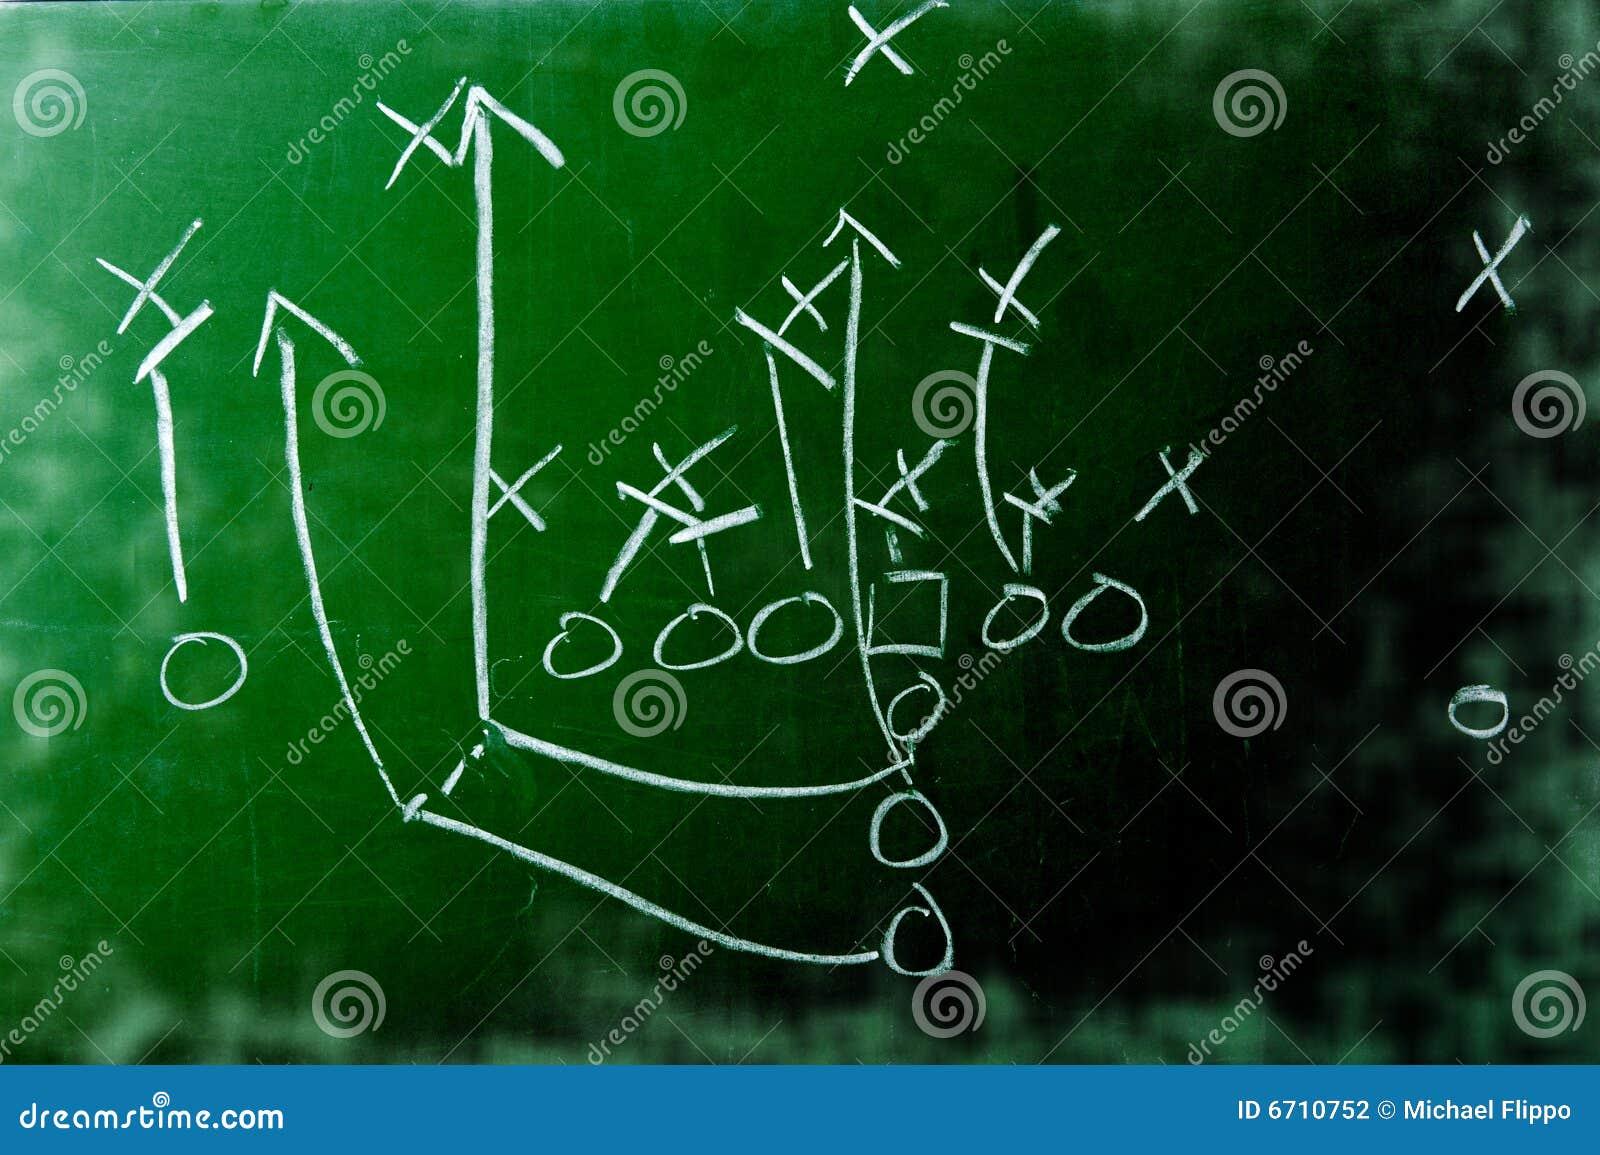 Football Play Diagram on Chalkboard